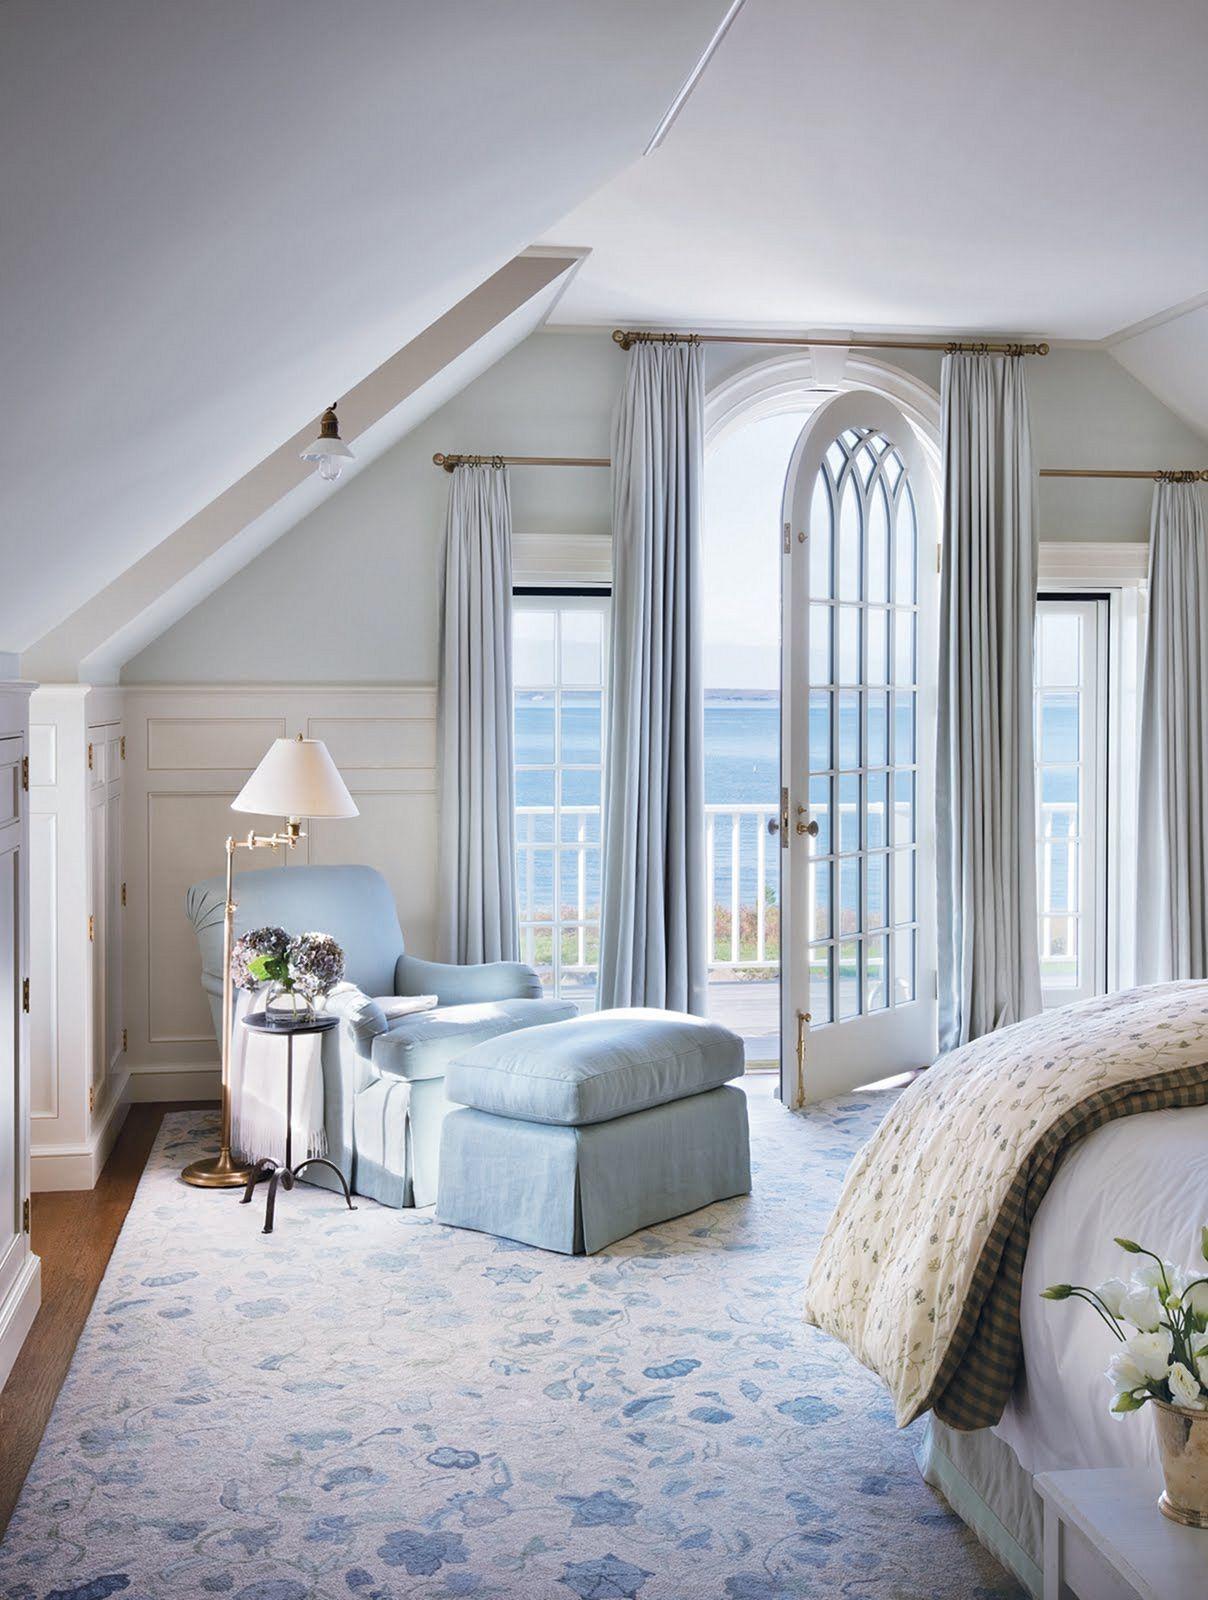 Beach Cottage Interior Design For Amazing Home inspiration 1